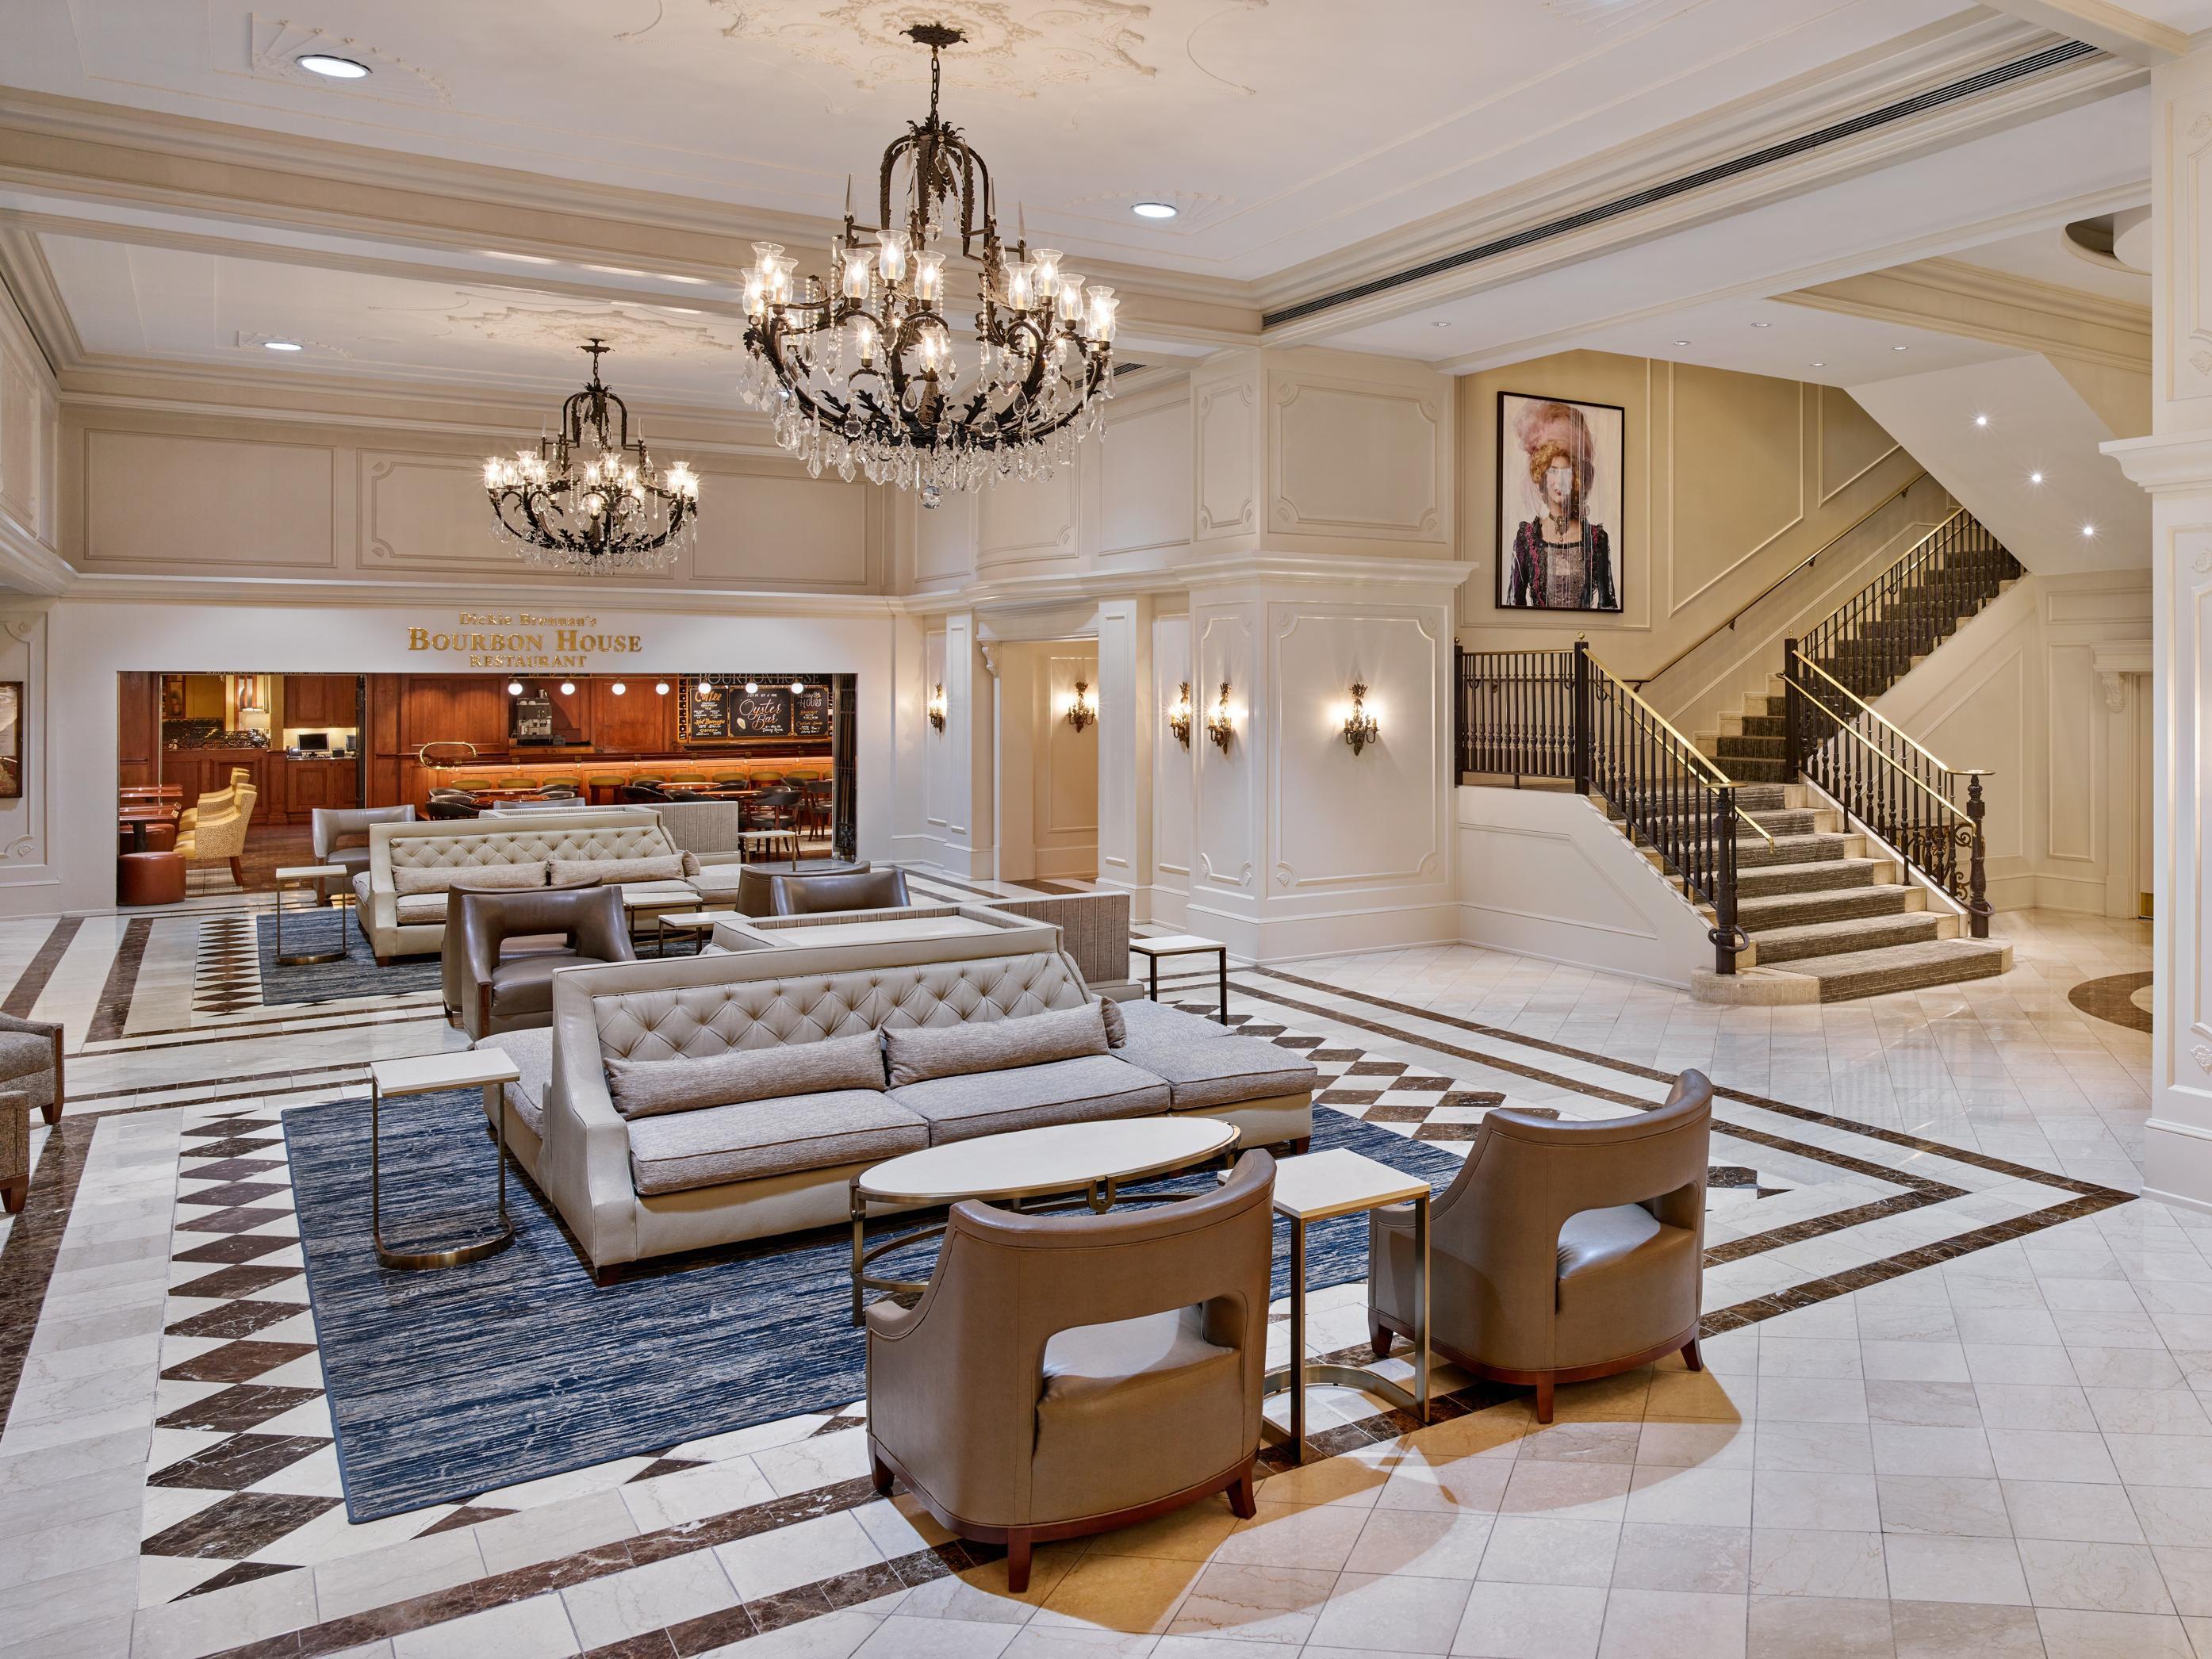 clsc hotels arts rooms garden orleans in bedroom msydt new hotel suite district warehouse renaissance hor suites